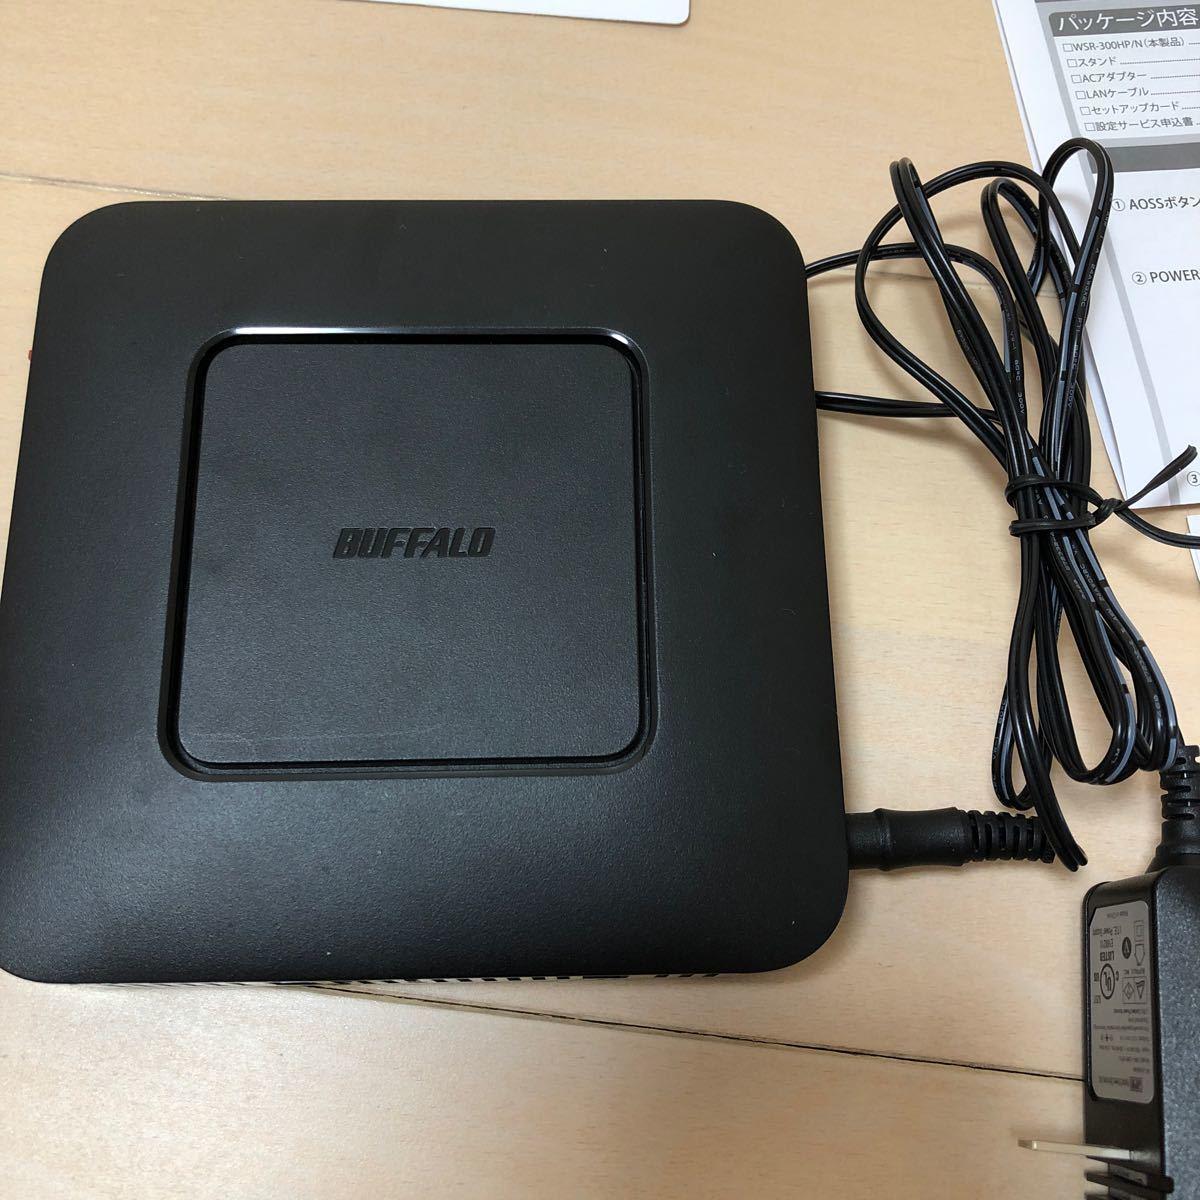 BUFFALO WiFi 無線LAN ルーター WSR-300HP/N